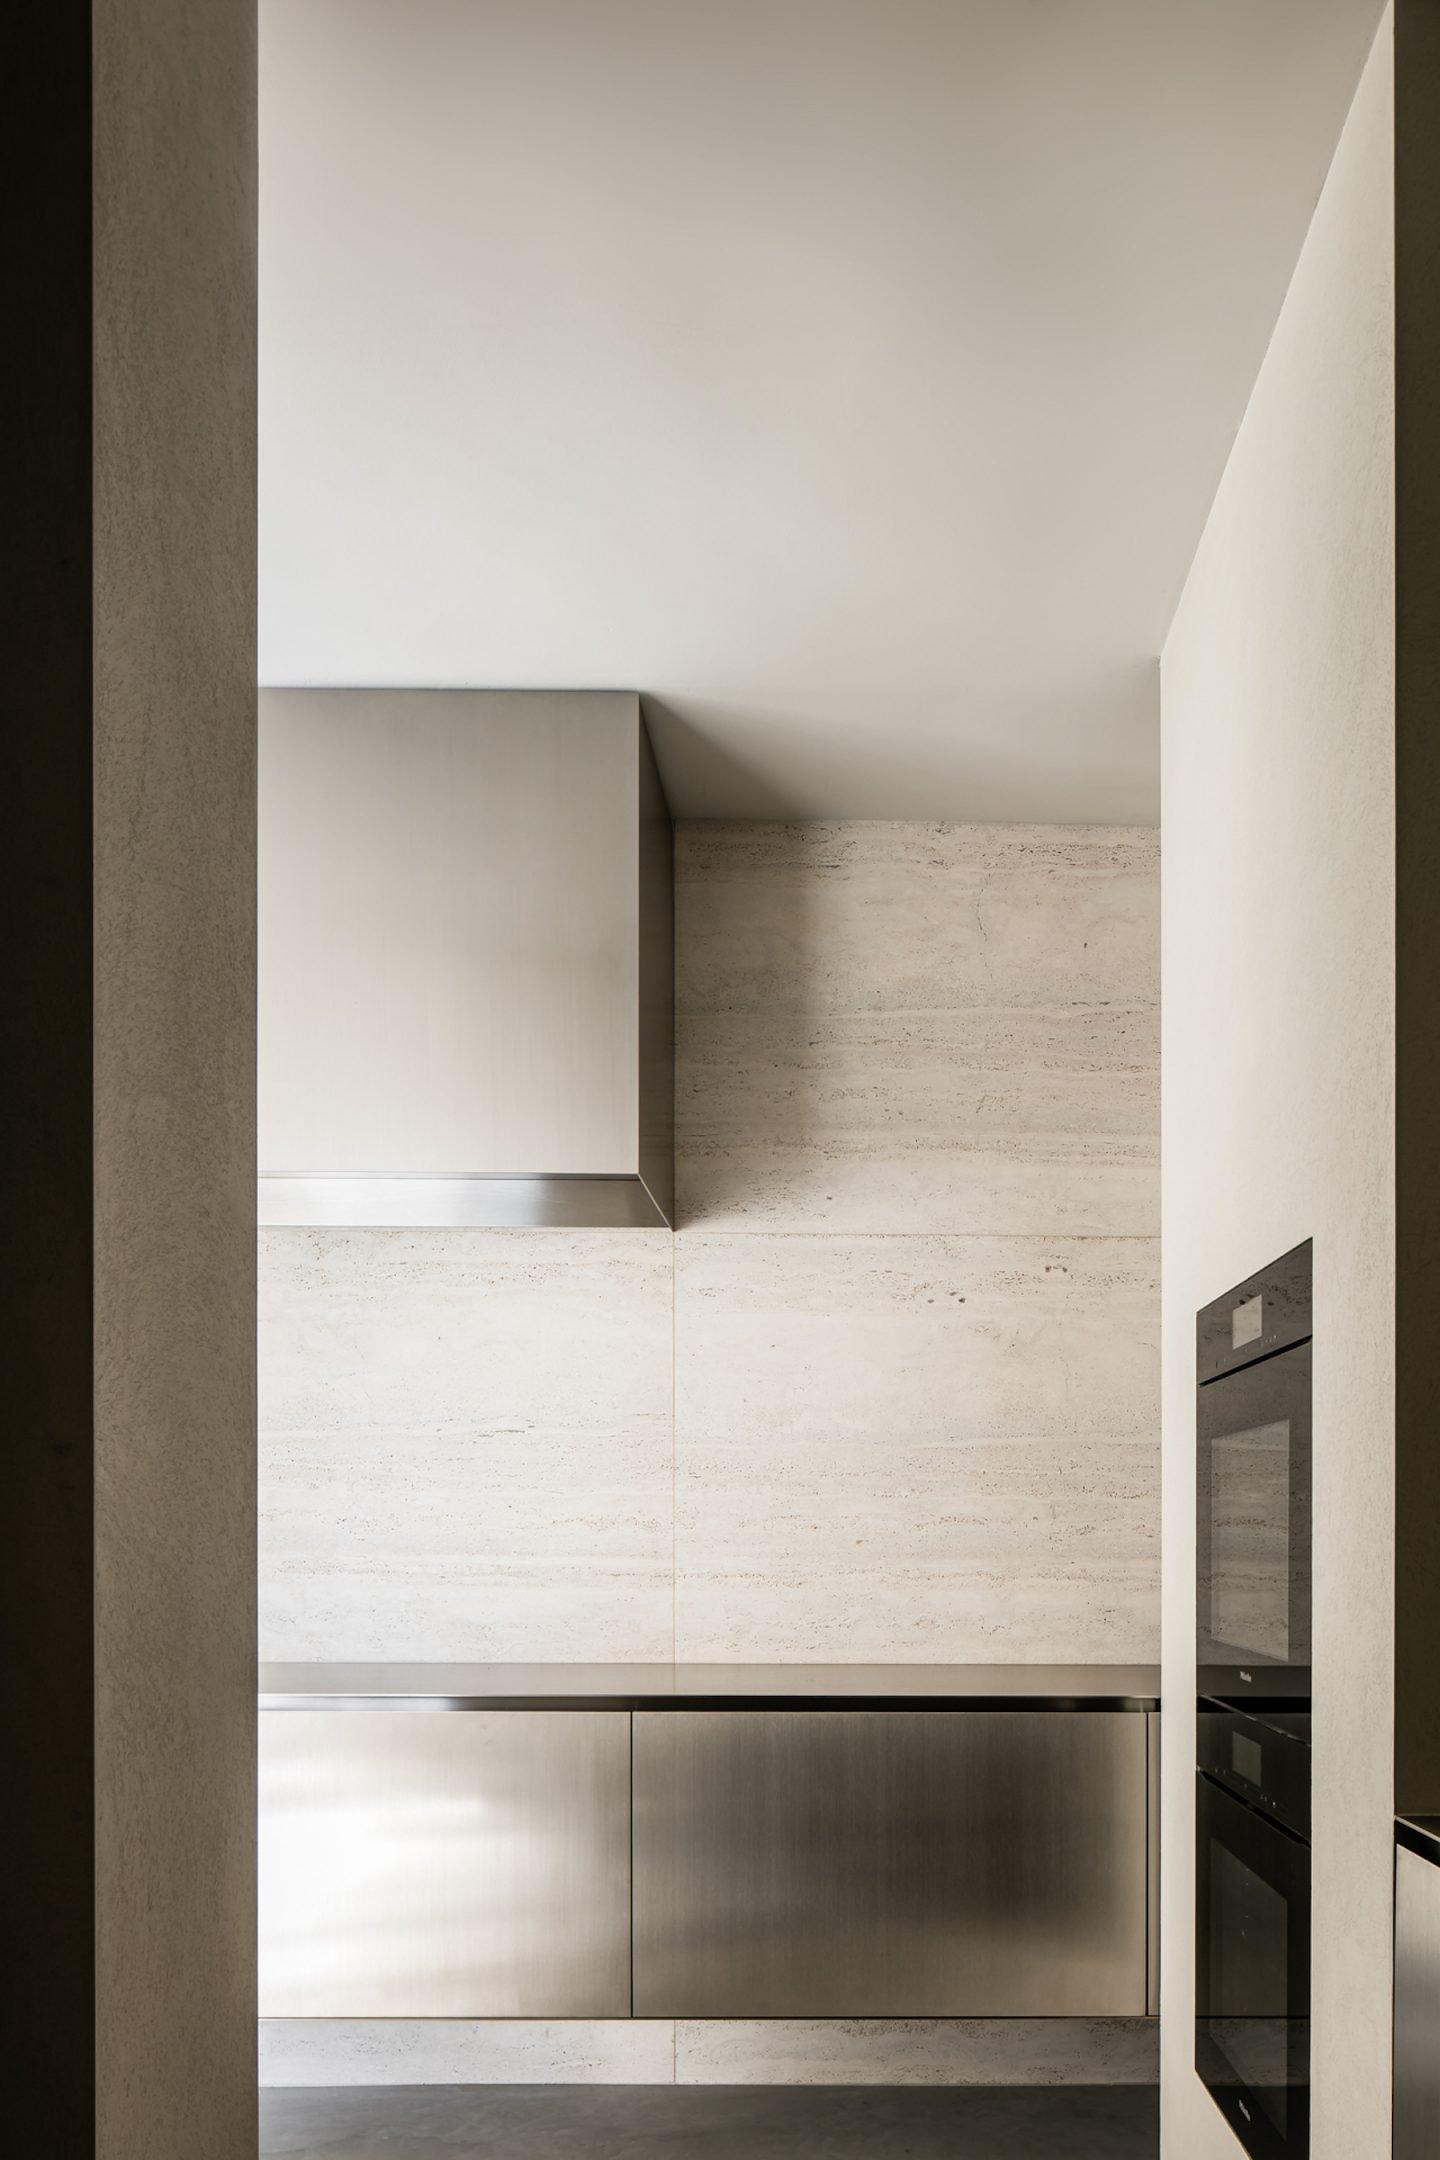 IGNANT-Design-Marie-Stadsbader-Diapal-06